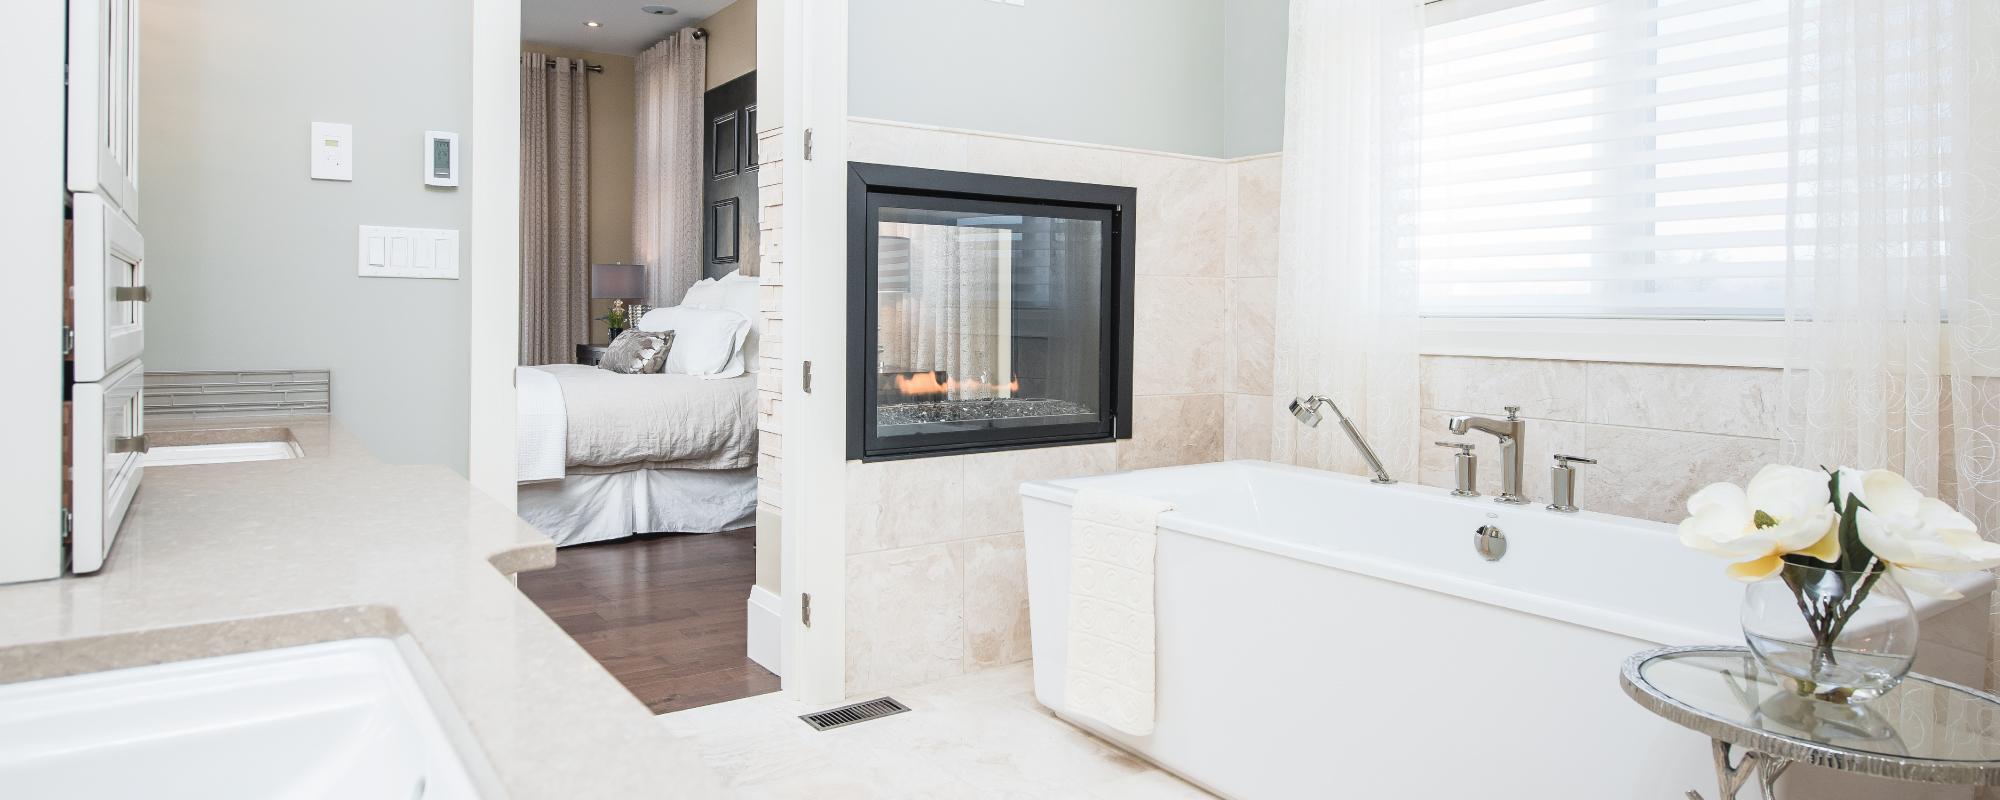 TrilliumWest | Builders | FABBIAN FINE HOMES